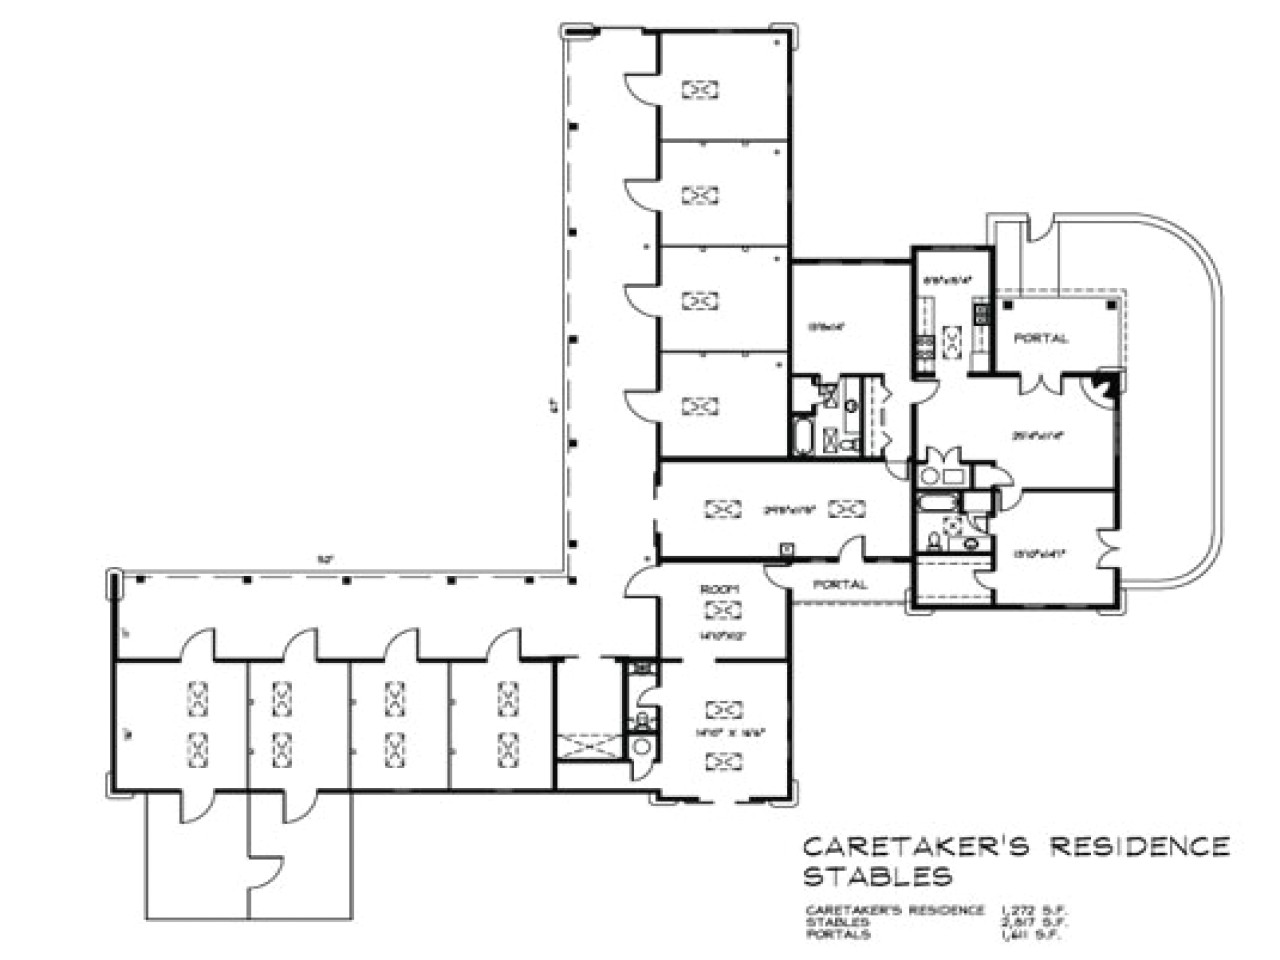 9af39820ac1af6d5 small guest house designs 16x22 guest house designs floor plans